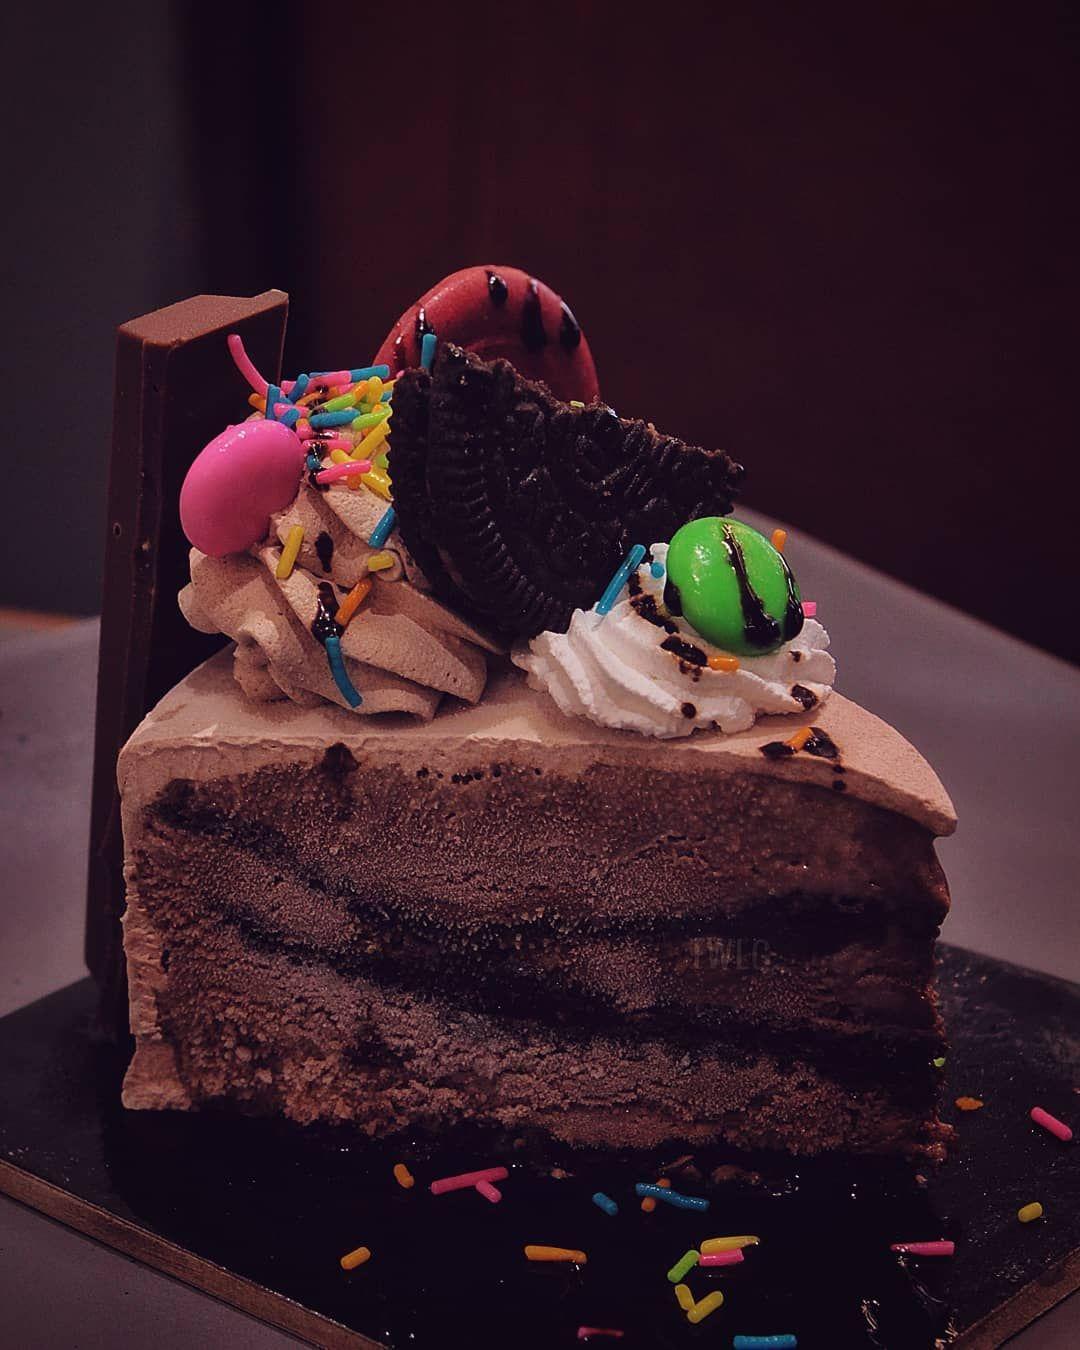 Oreo Cookie Blizzard ❤️ @huberandholly , Koregaon Park, Pune.  Zomato : Foodie15gadgil. @foodtalkindia @thepunefoodie @punebhukkad